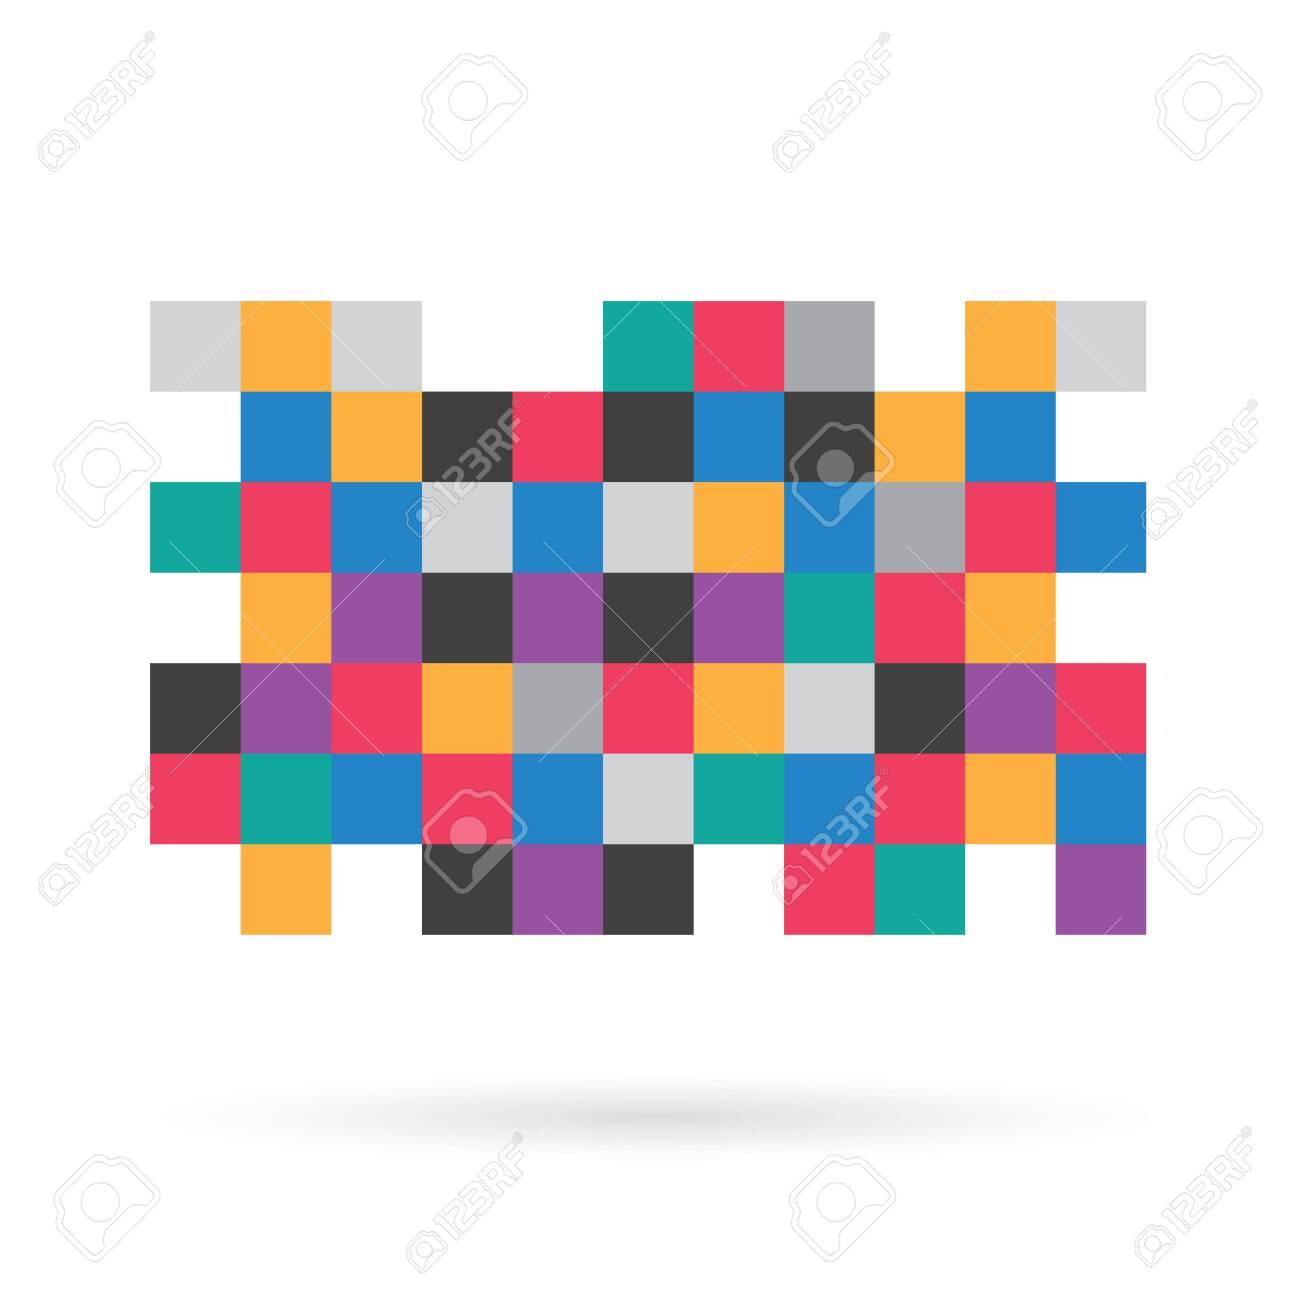 colorful pixel censorship pattern - vector illustration - 143580410